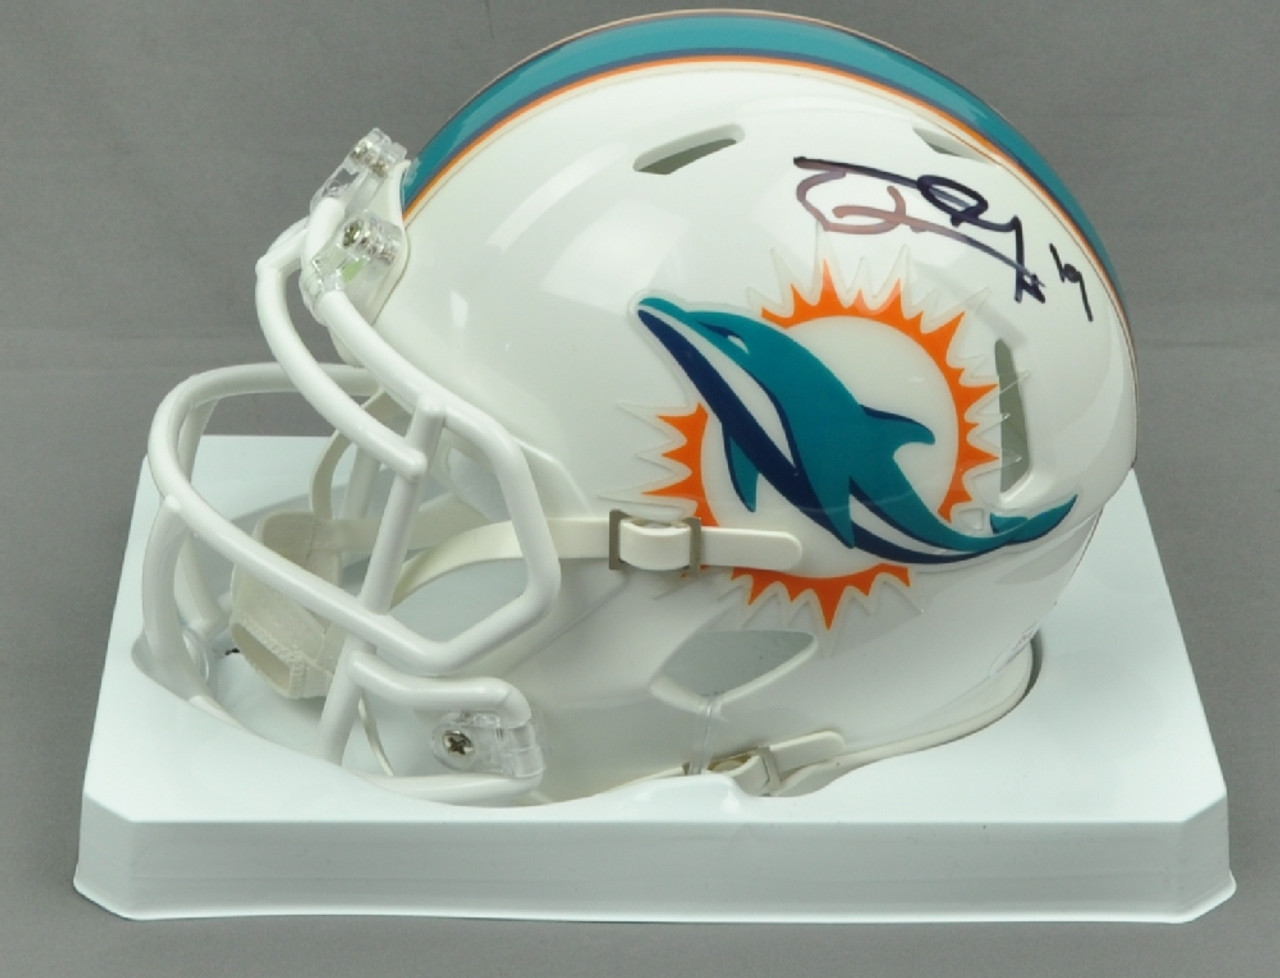 7efd2352 NFL Miami Dolphins Running Back Jakeem Grant 19 Signed Autographed  Inscribed Riddell Mini Helmet JSA